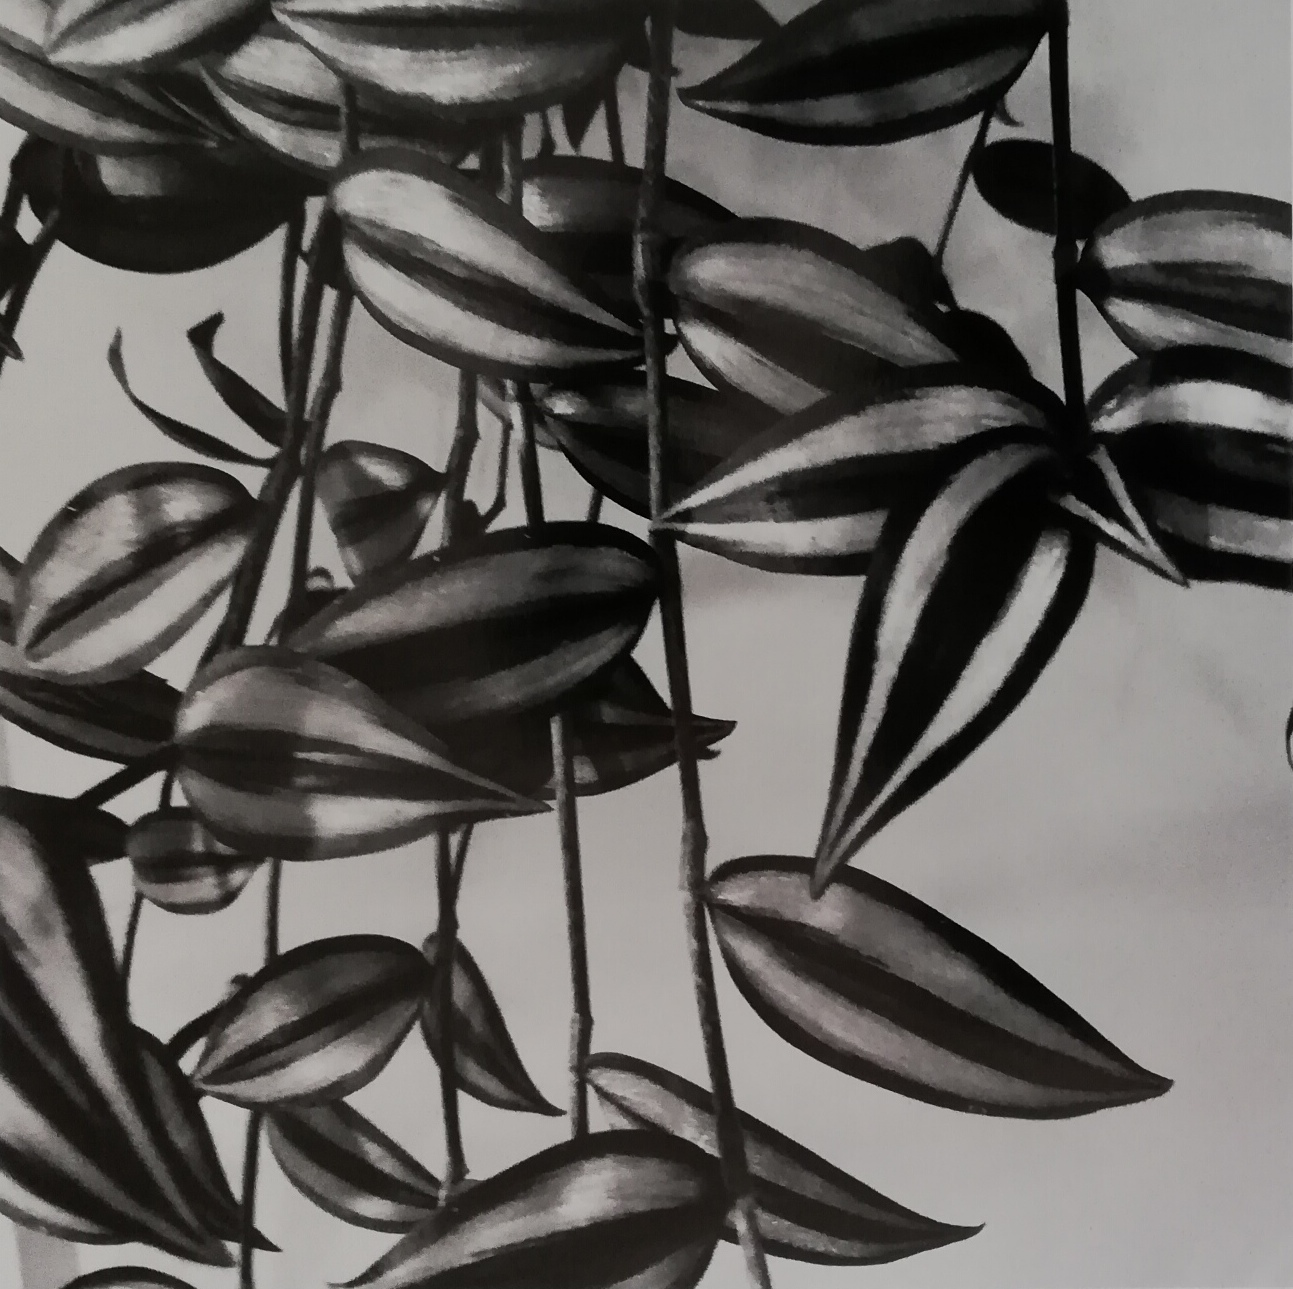 Peter Peryer,  Tradescantia zebrina , 2018, edition of 10, pigment inks on paper, 290 x 290 mm